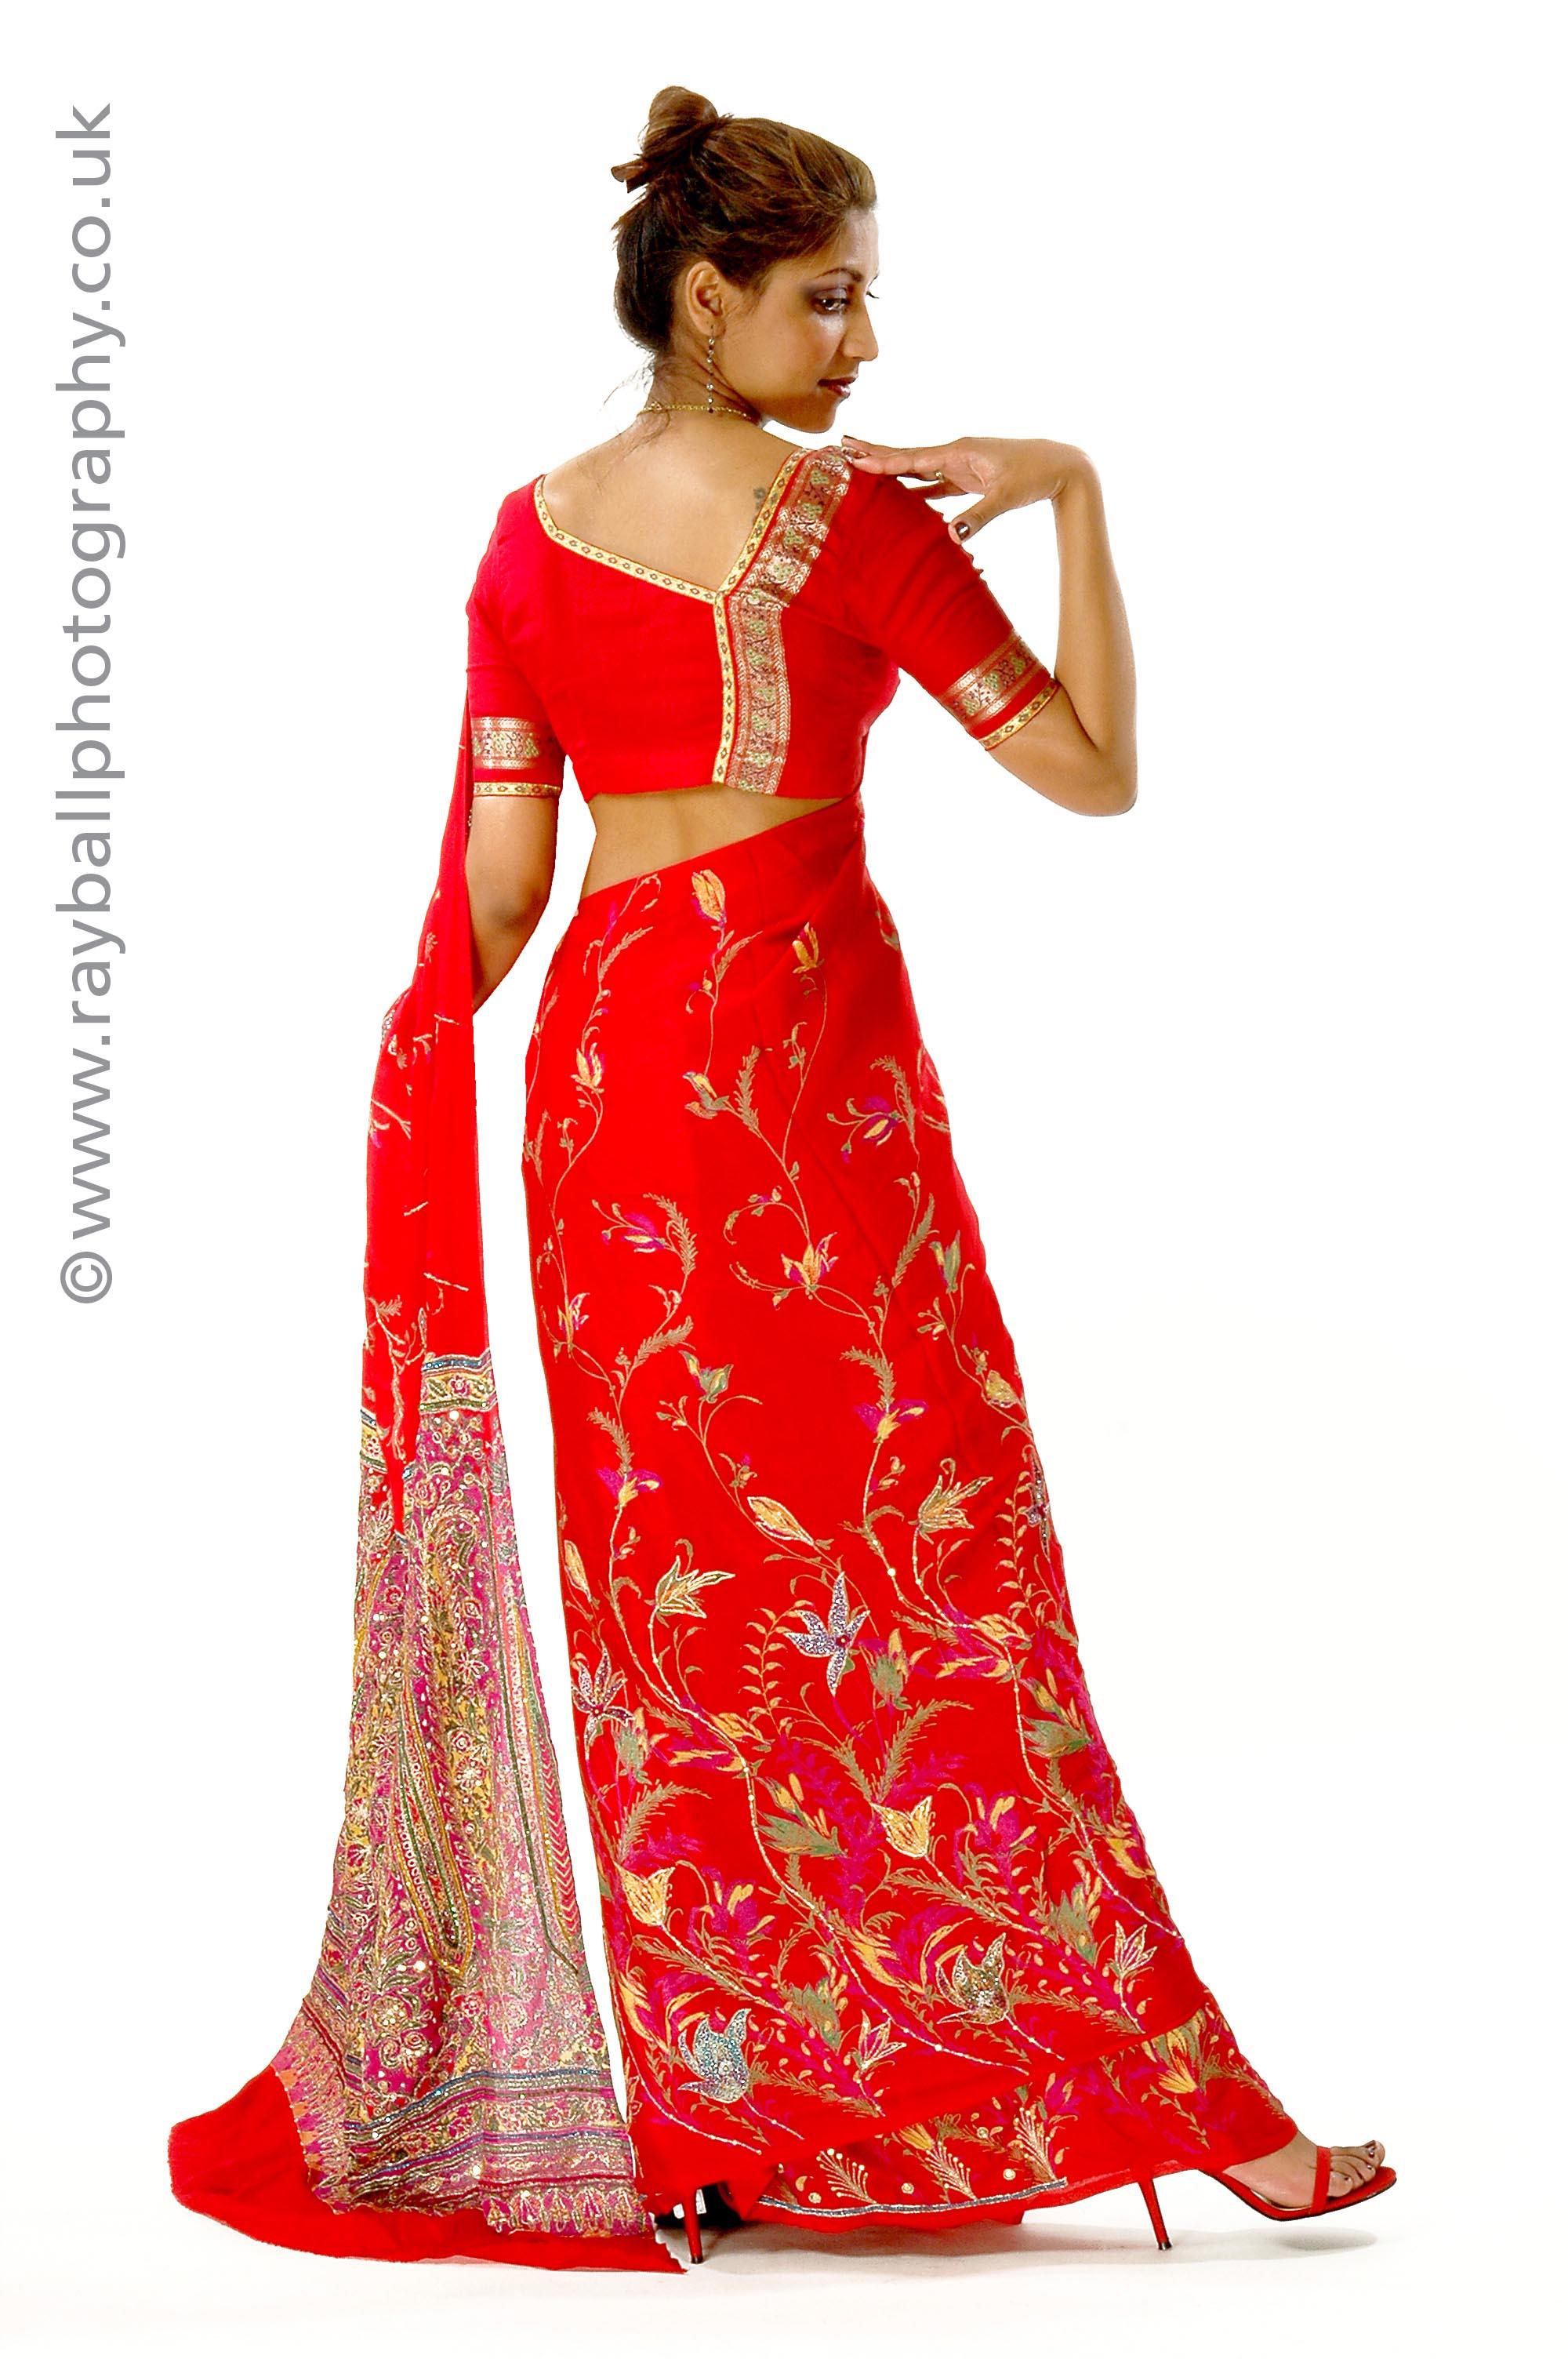 Ewell model wearing sari at Epsom Photography Studio.